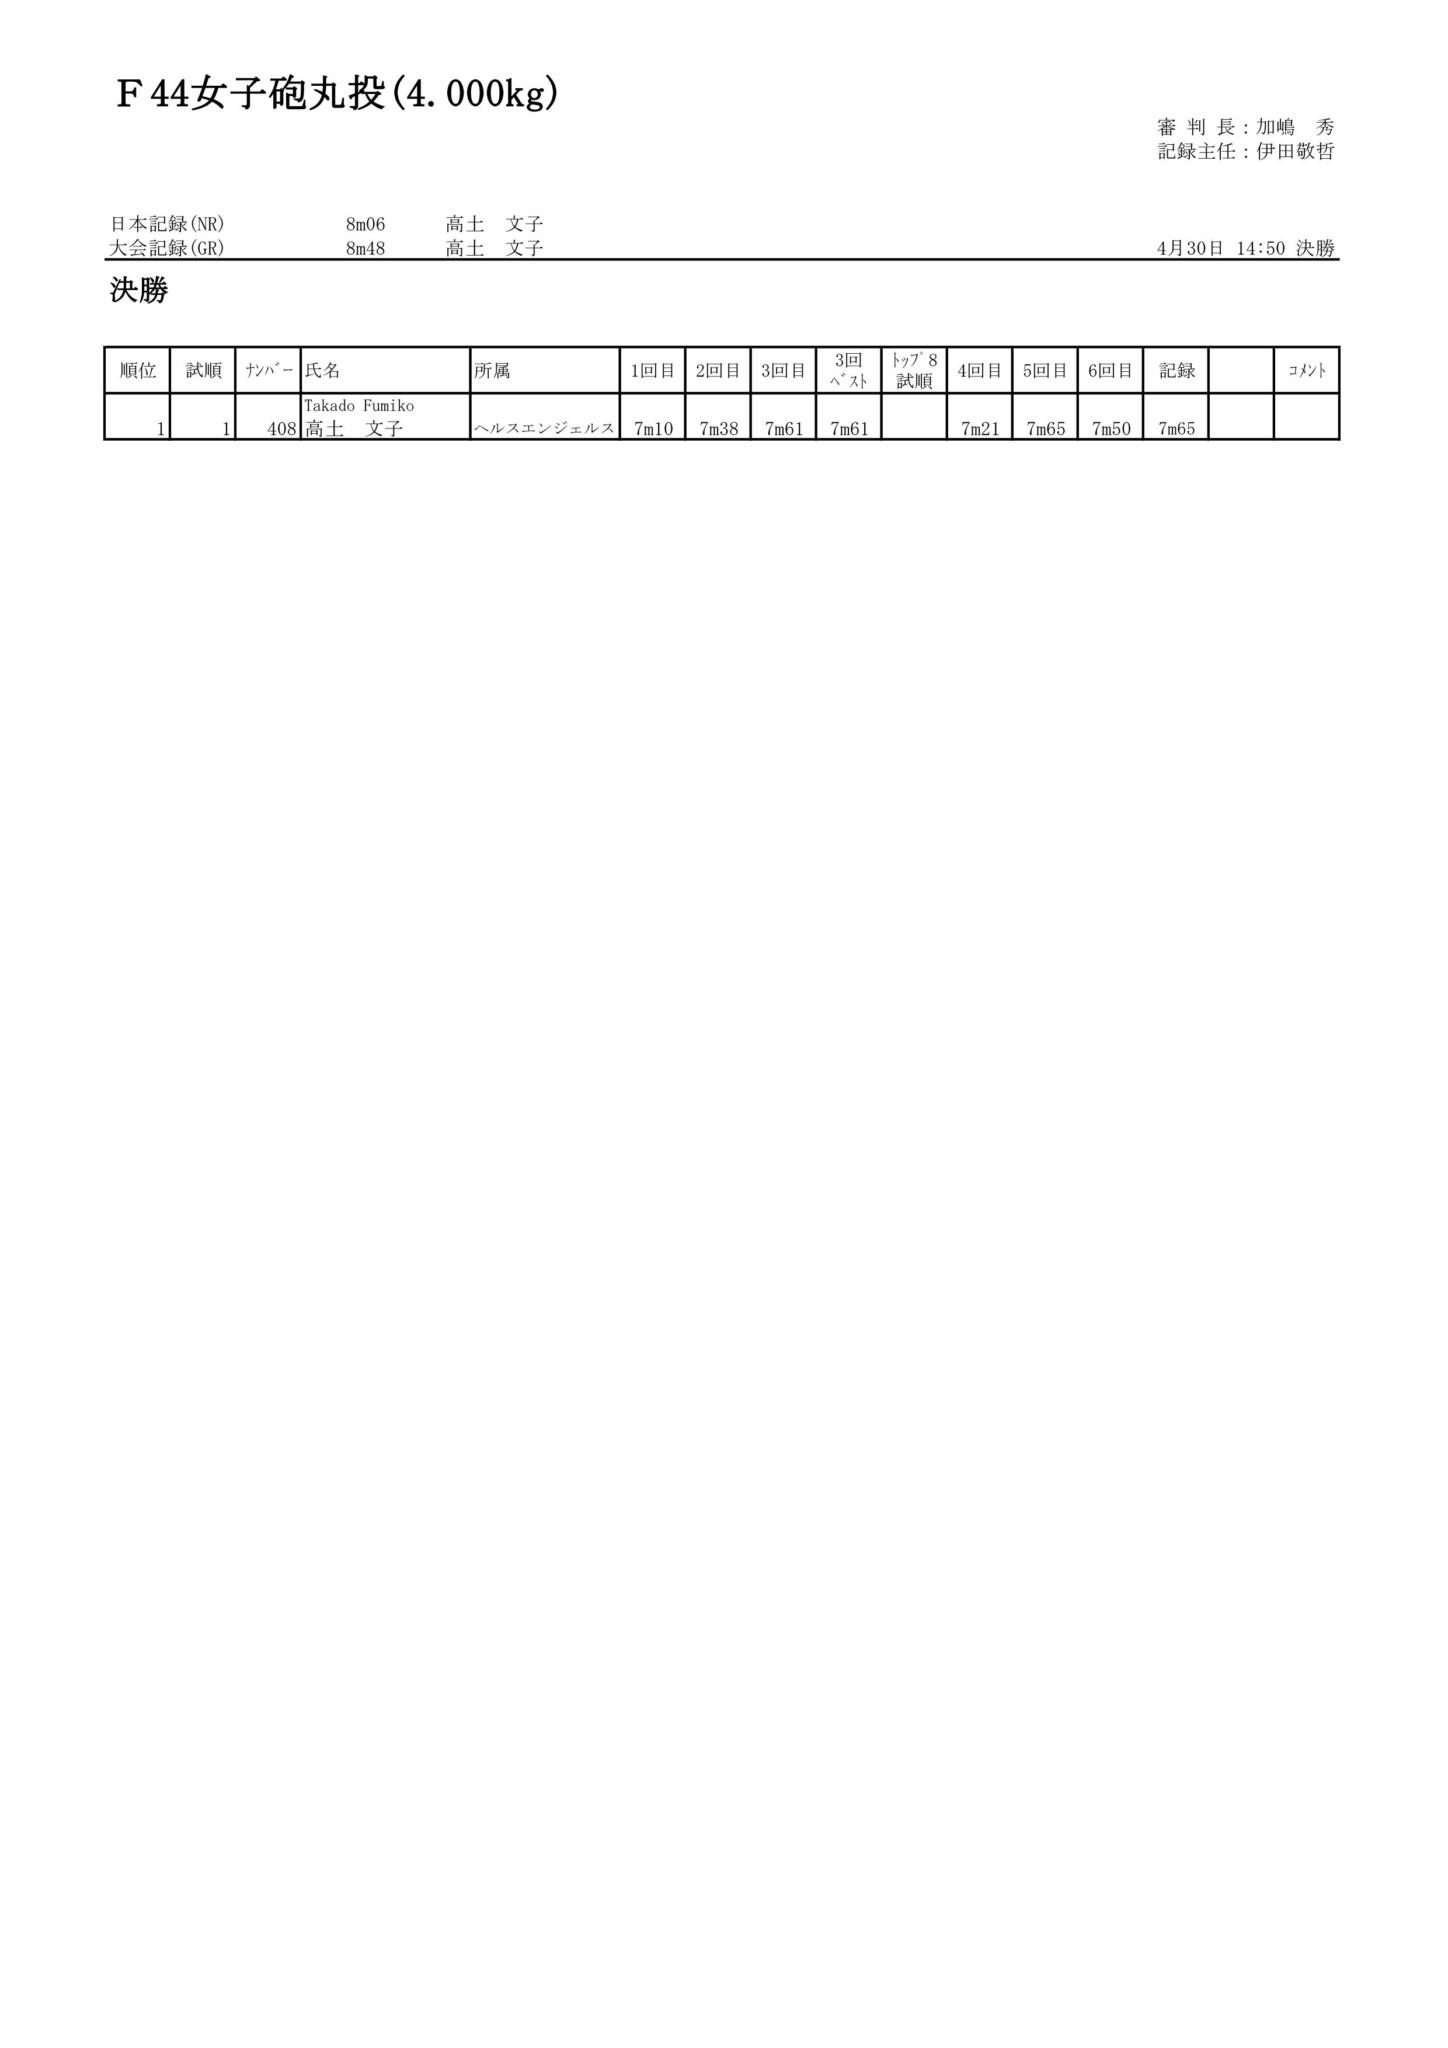 108F44女子砲丸投(4.000kg)_01